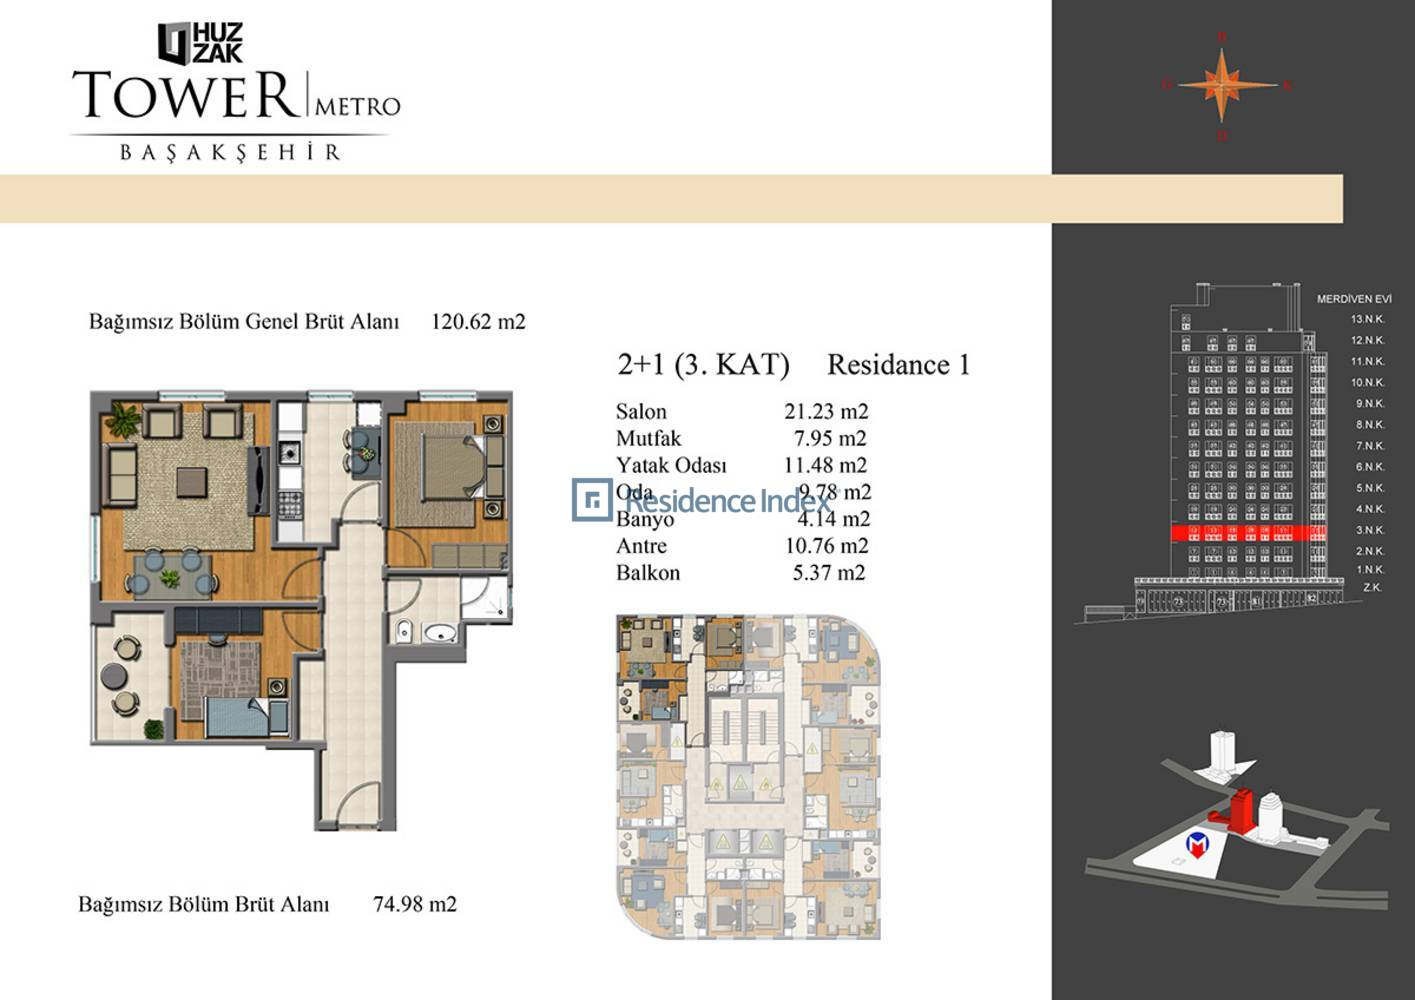 Huzzak Tower Metro Residence 1